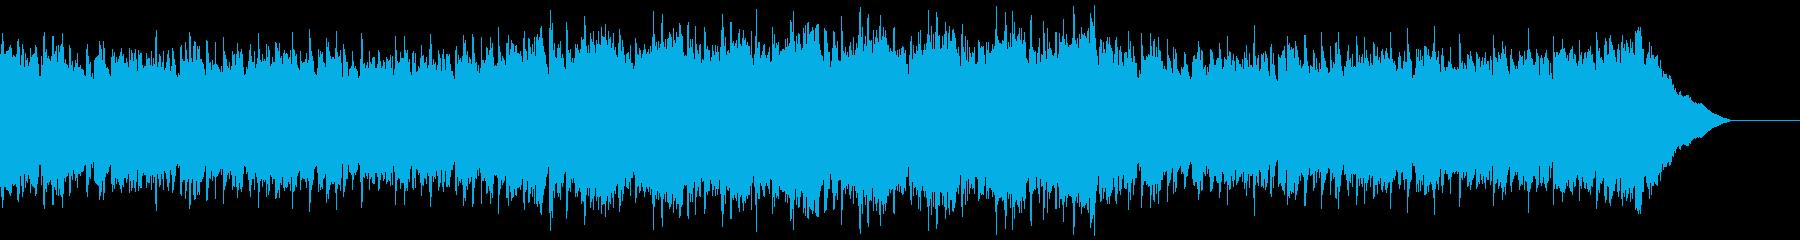 CM・陽気な夏の海・ポップの再生済みの波形